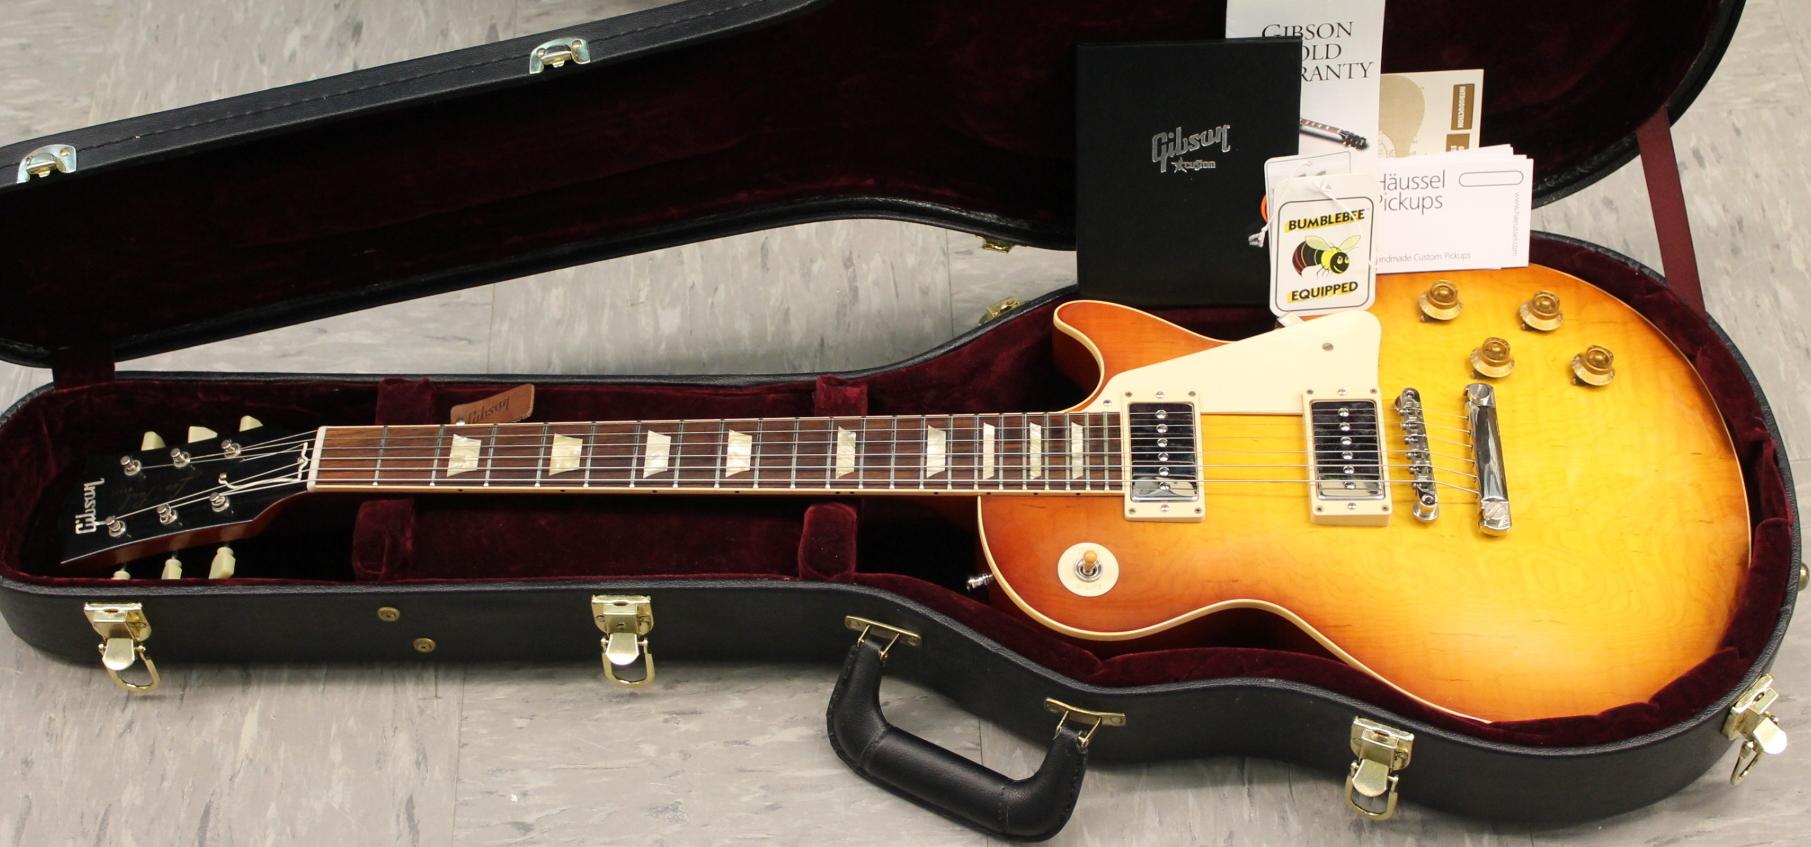 gibson custom shop 1959 reissue les paul vos 2010 guitar for sale kitarakuu. Black Bedroom Furniture Sets. Home Design Ideas